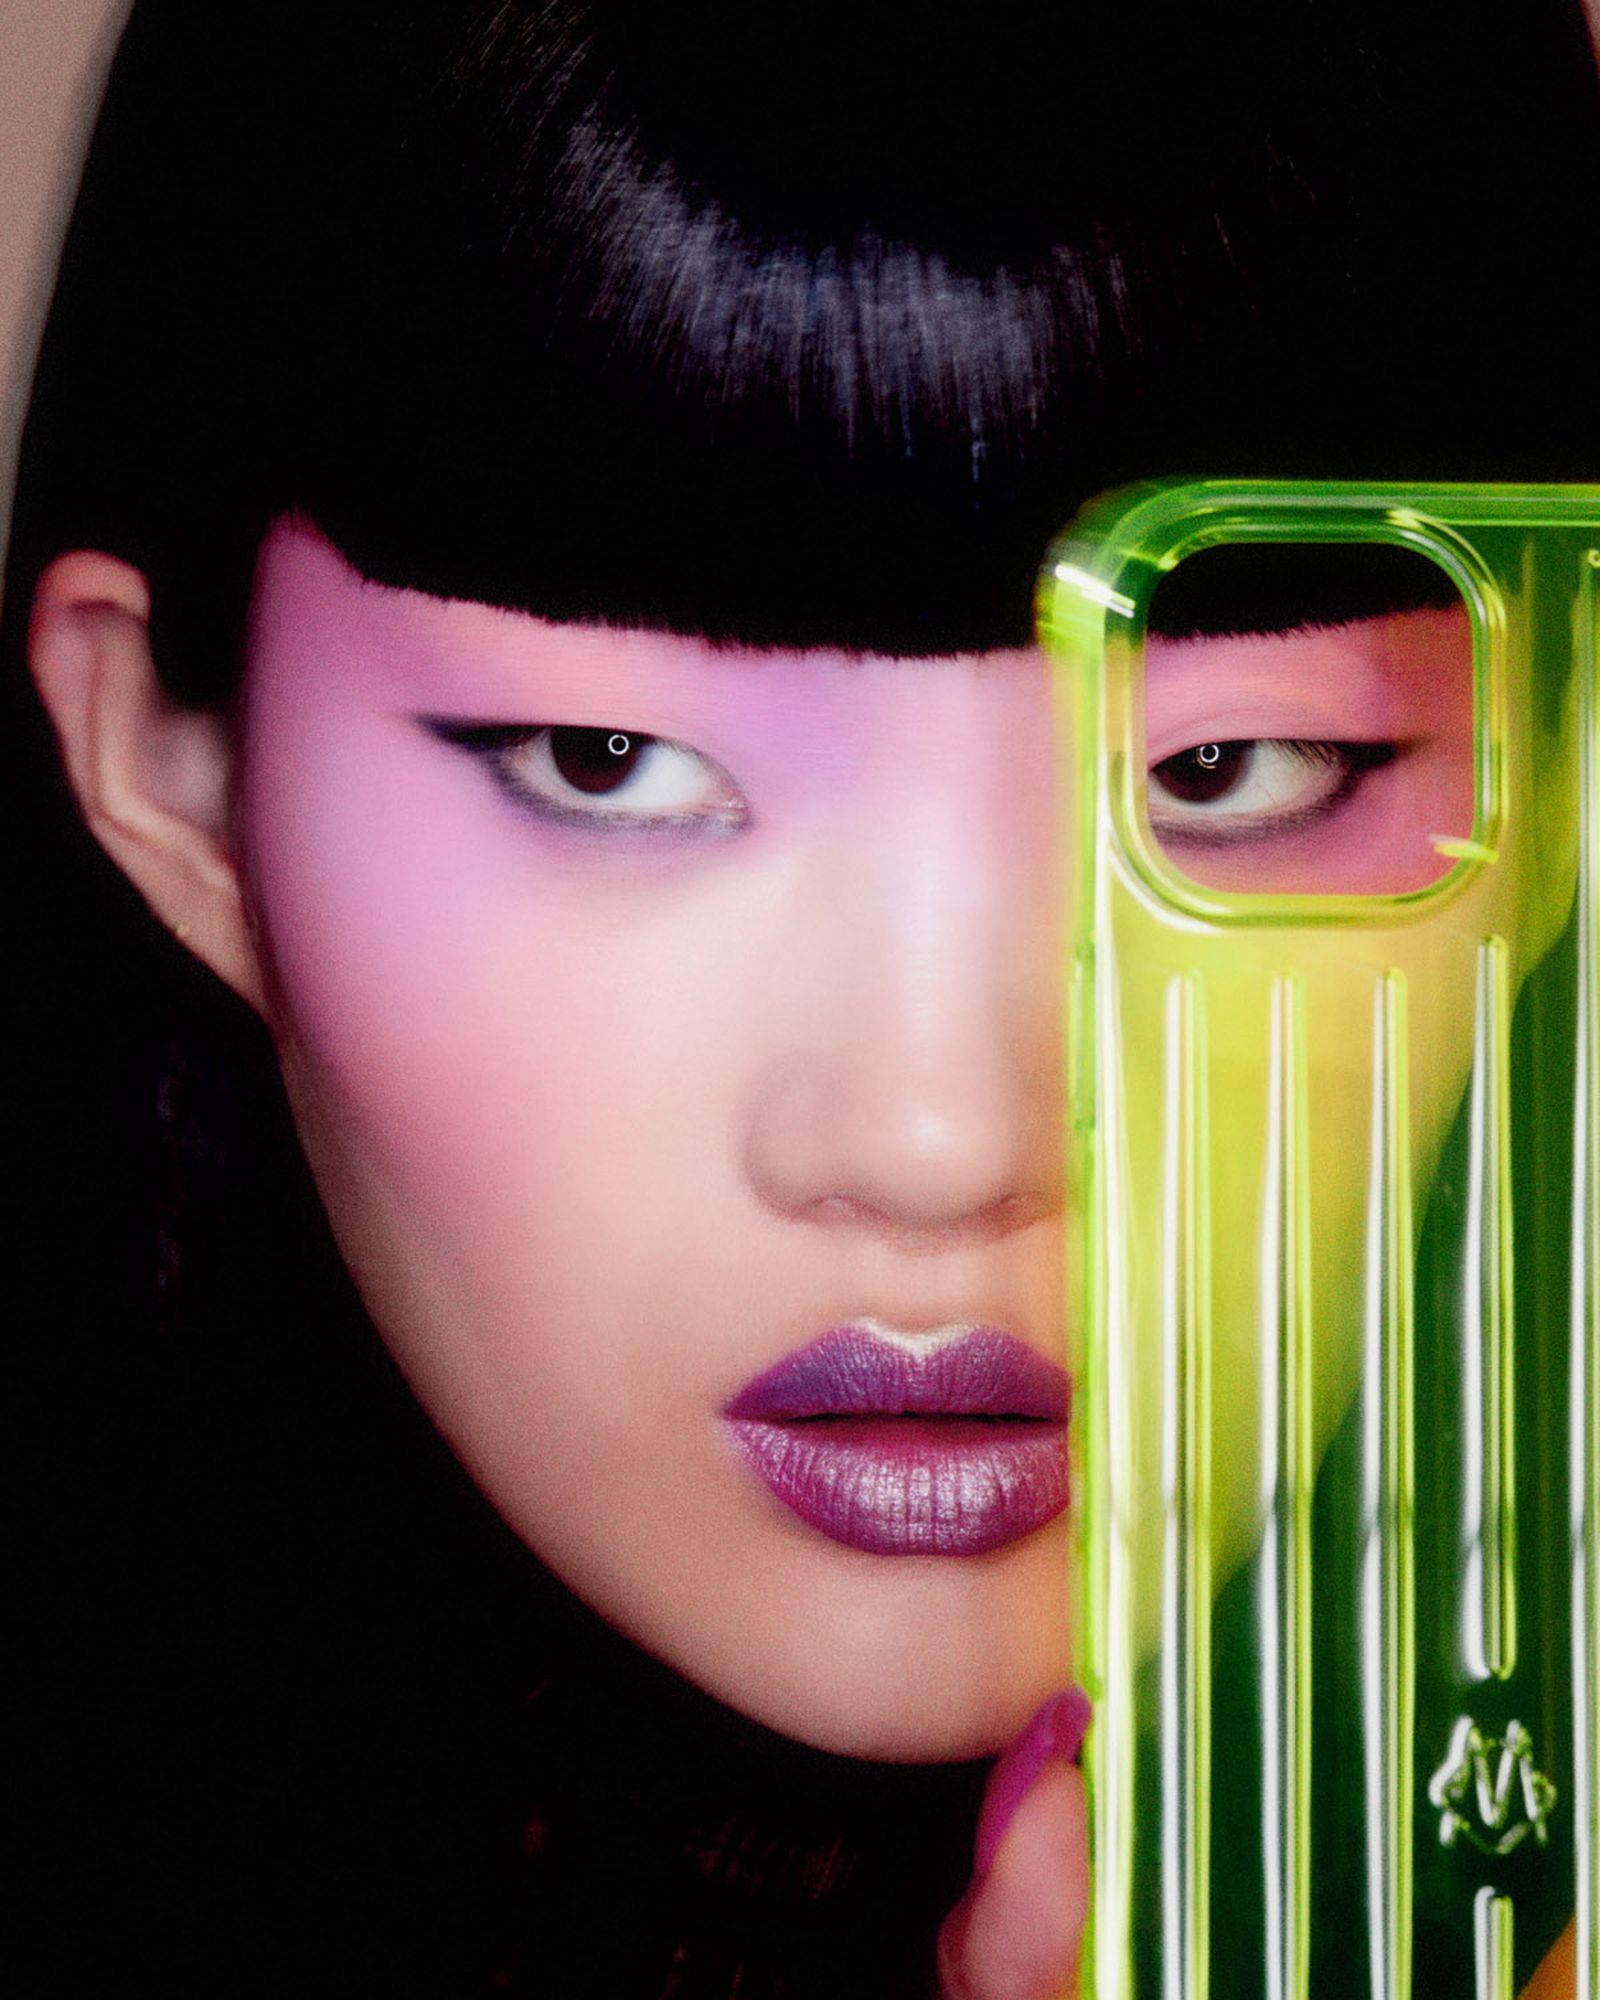 instagram-curators-new-influencers-rimowa-011